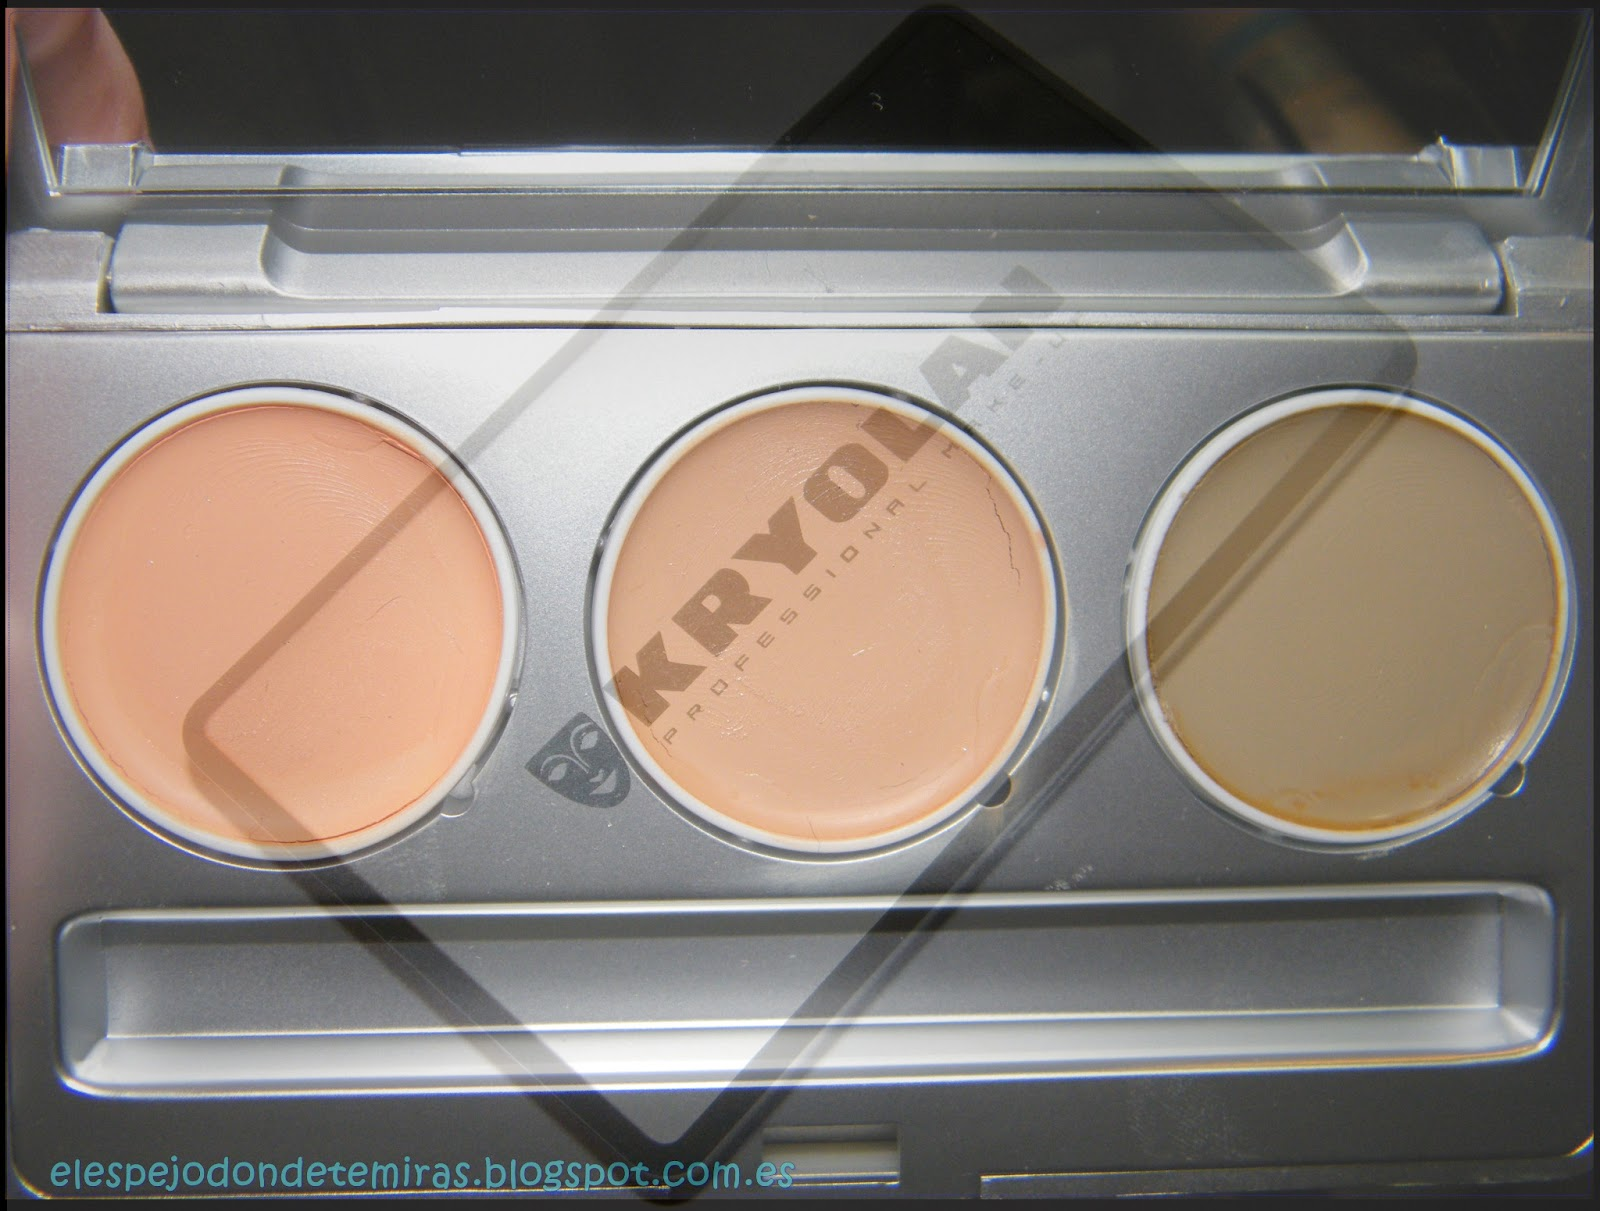 Correctores kryolan fs61 beige 576 salm n y fs64 verde for Donde venden espejos